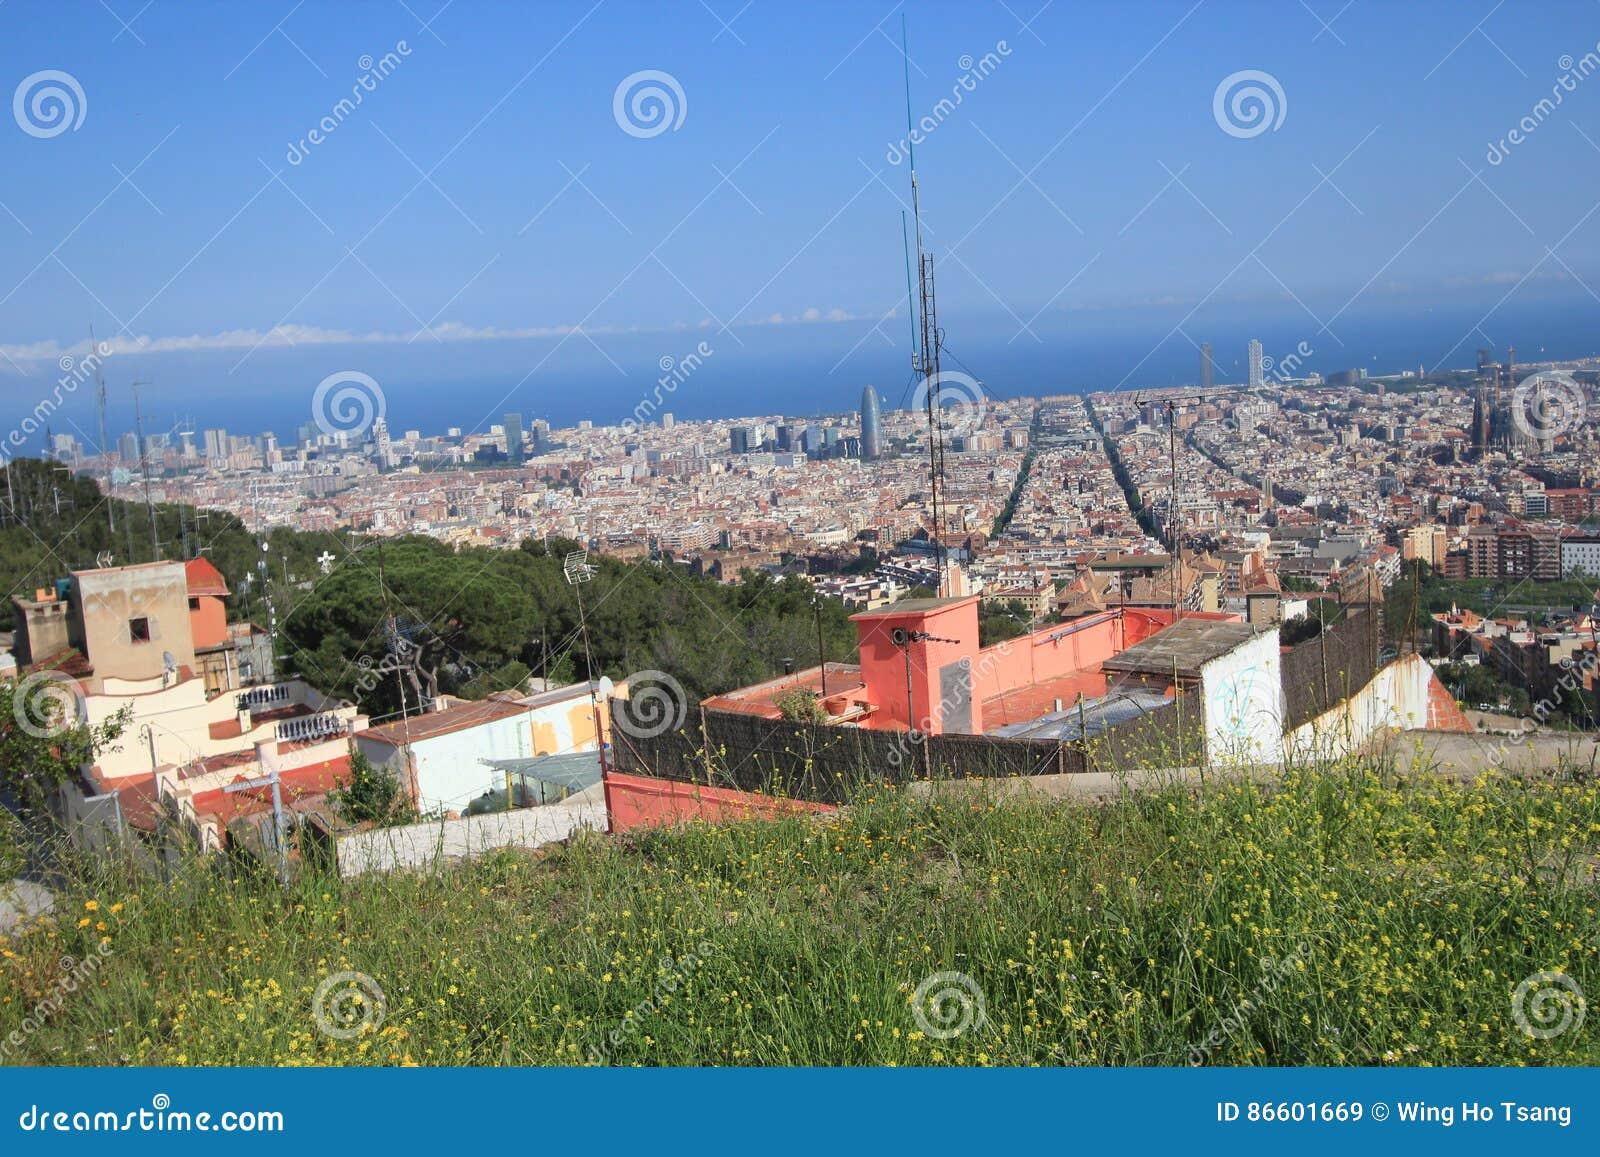 Spain Barcelona Street View Editorial Stock Image Image Of Majestic Espanya 86601669